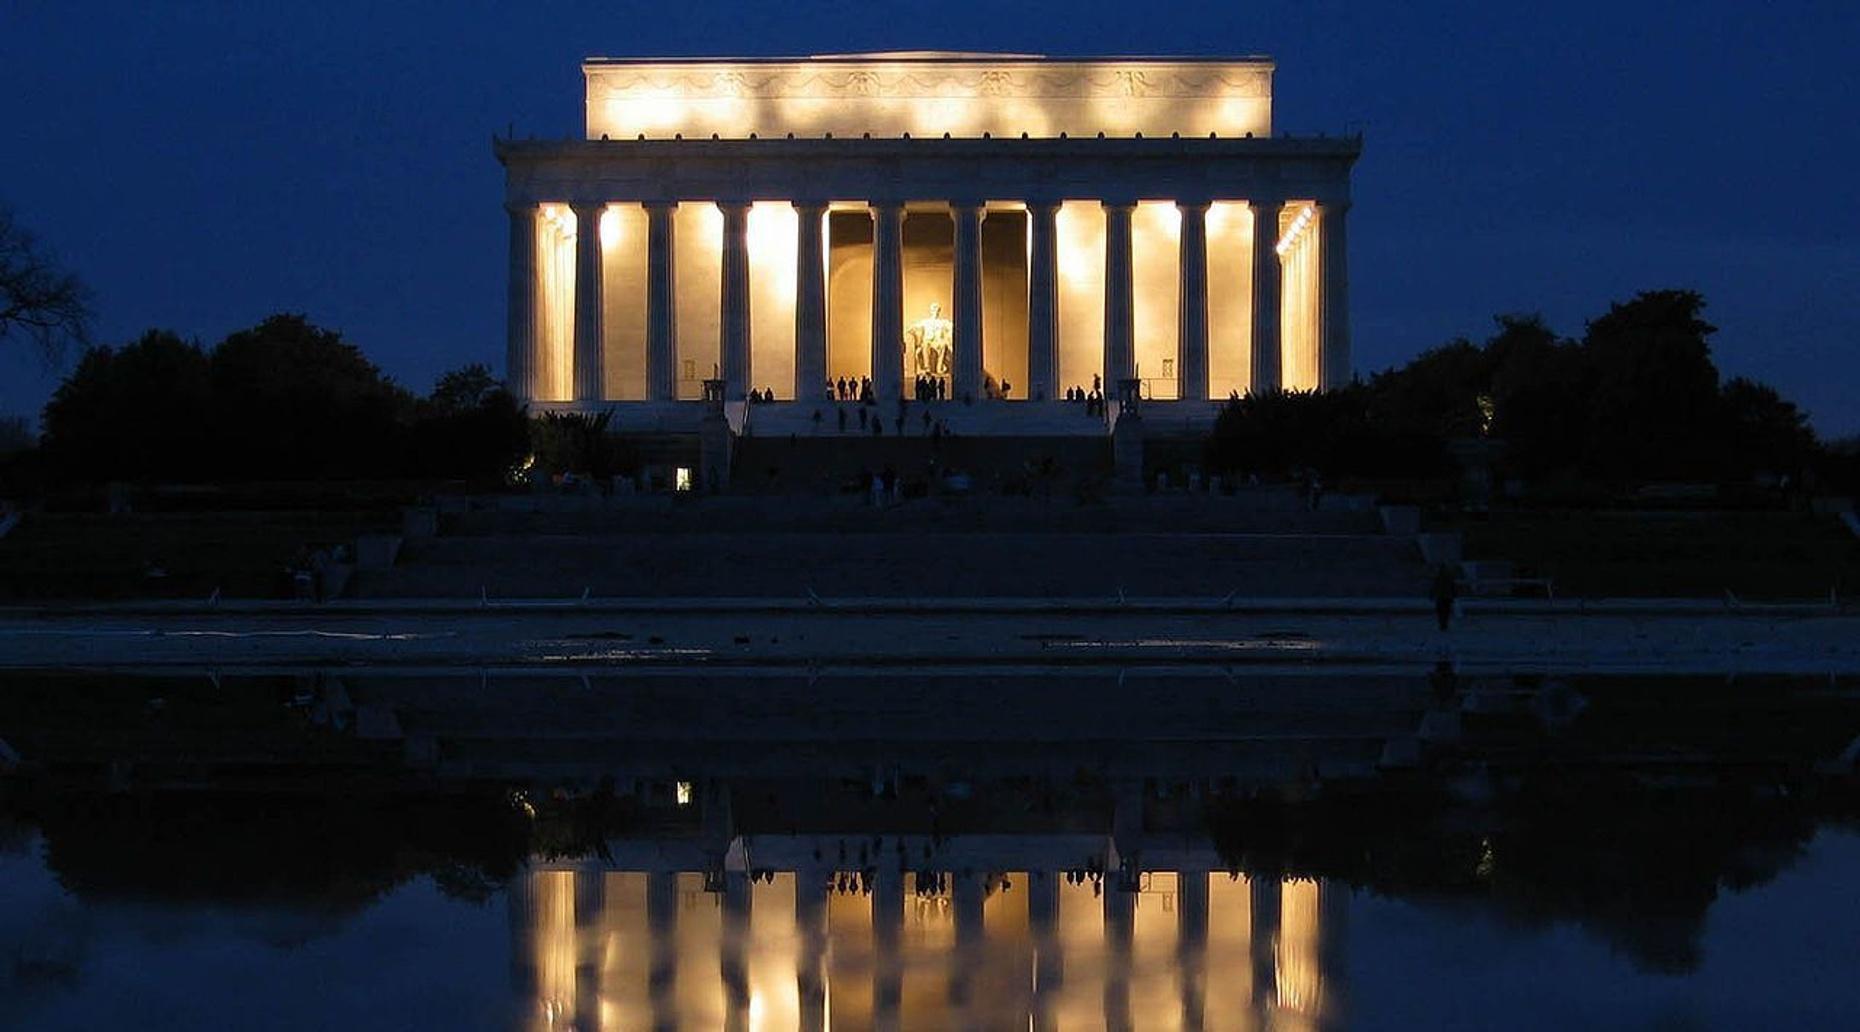 Private Washington D.C. Night Tour